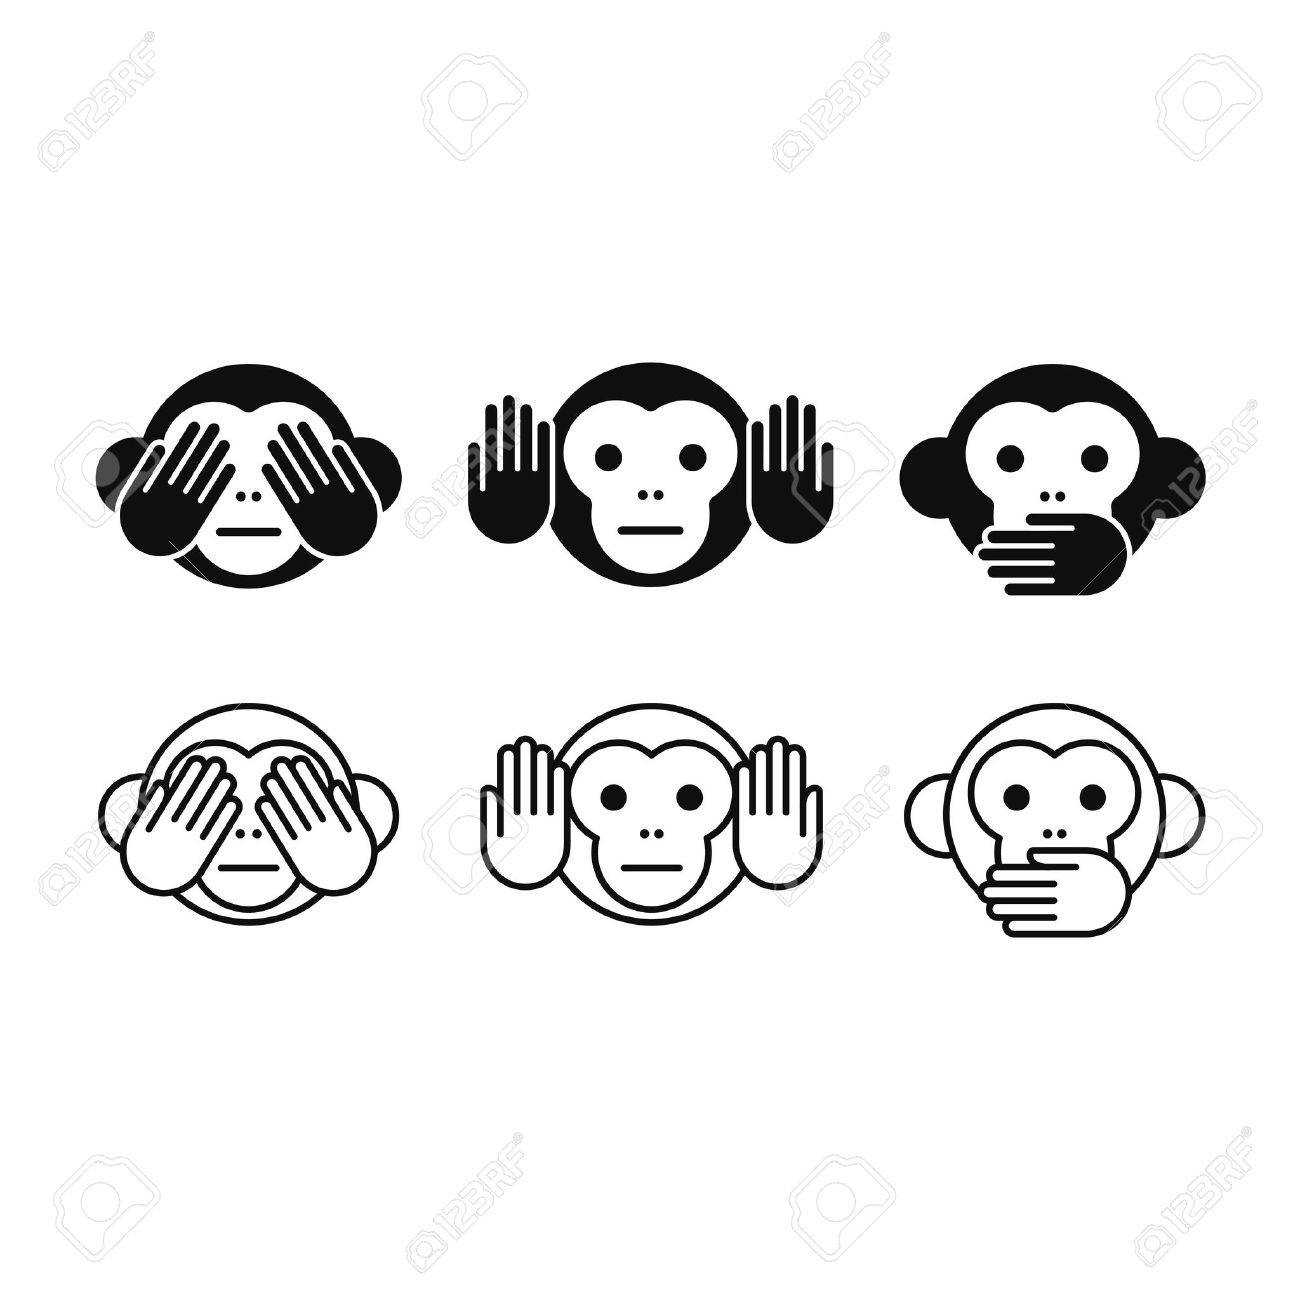 See no evil hear no evil speak no evil monkey icon set in two